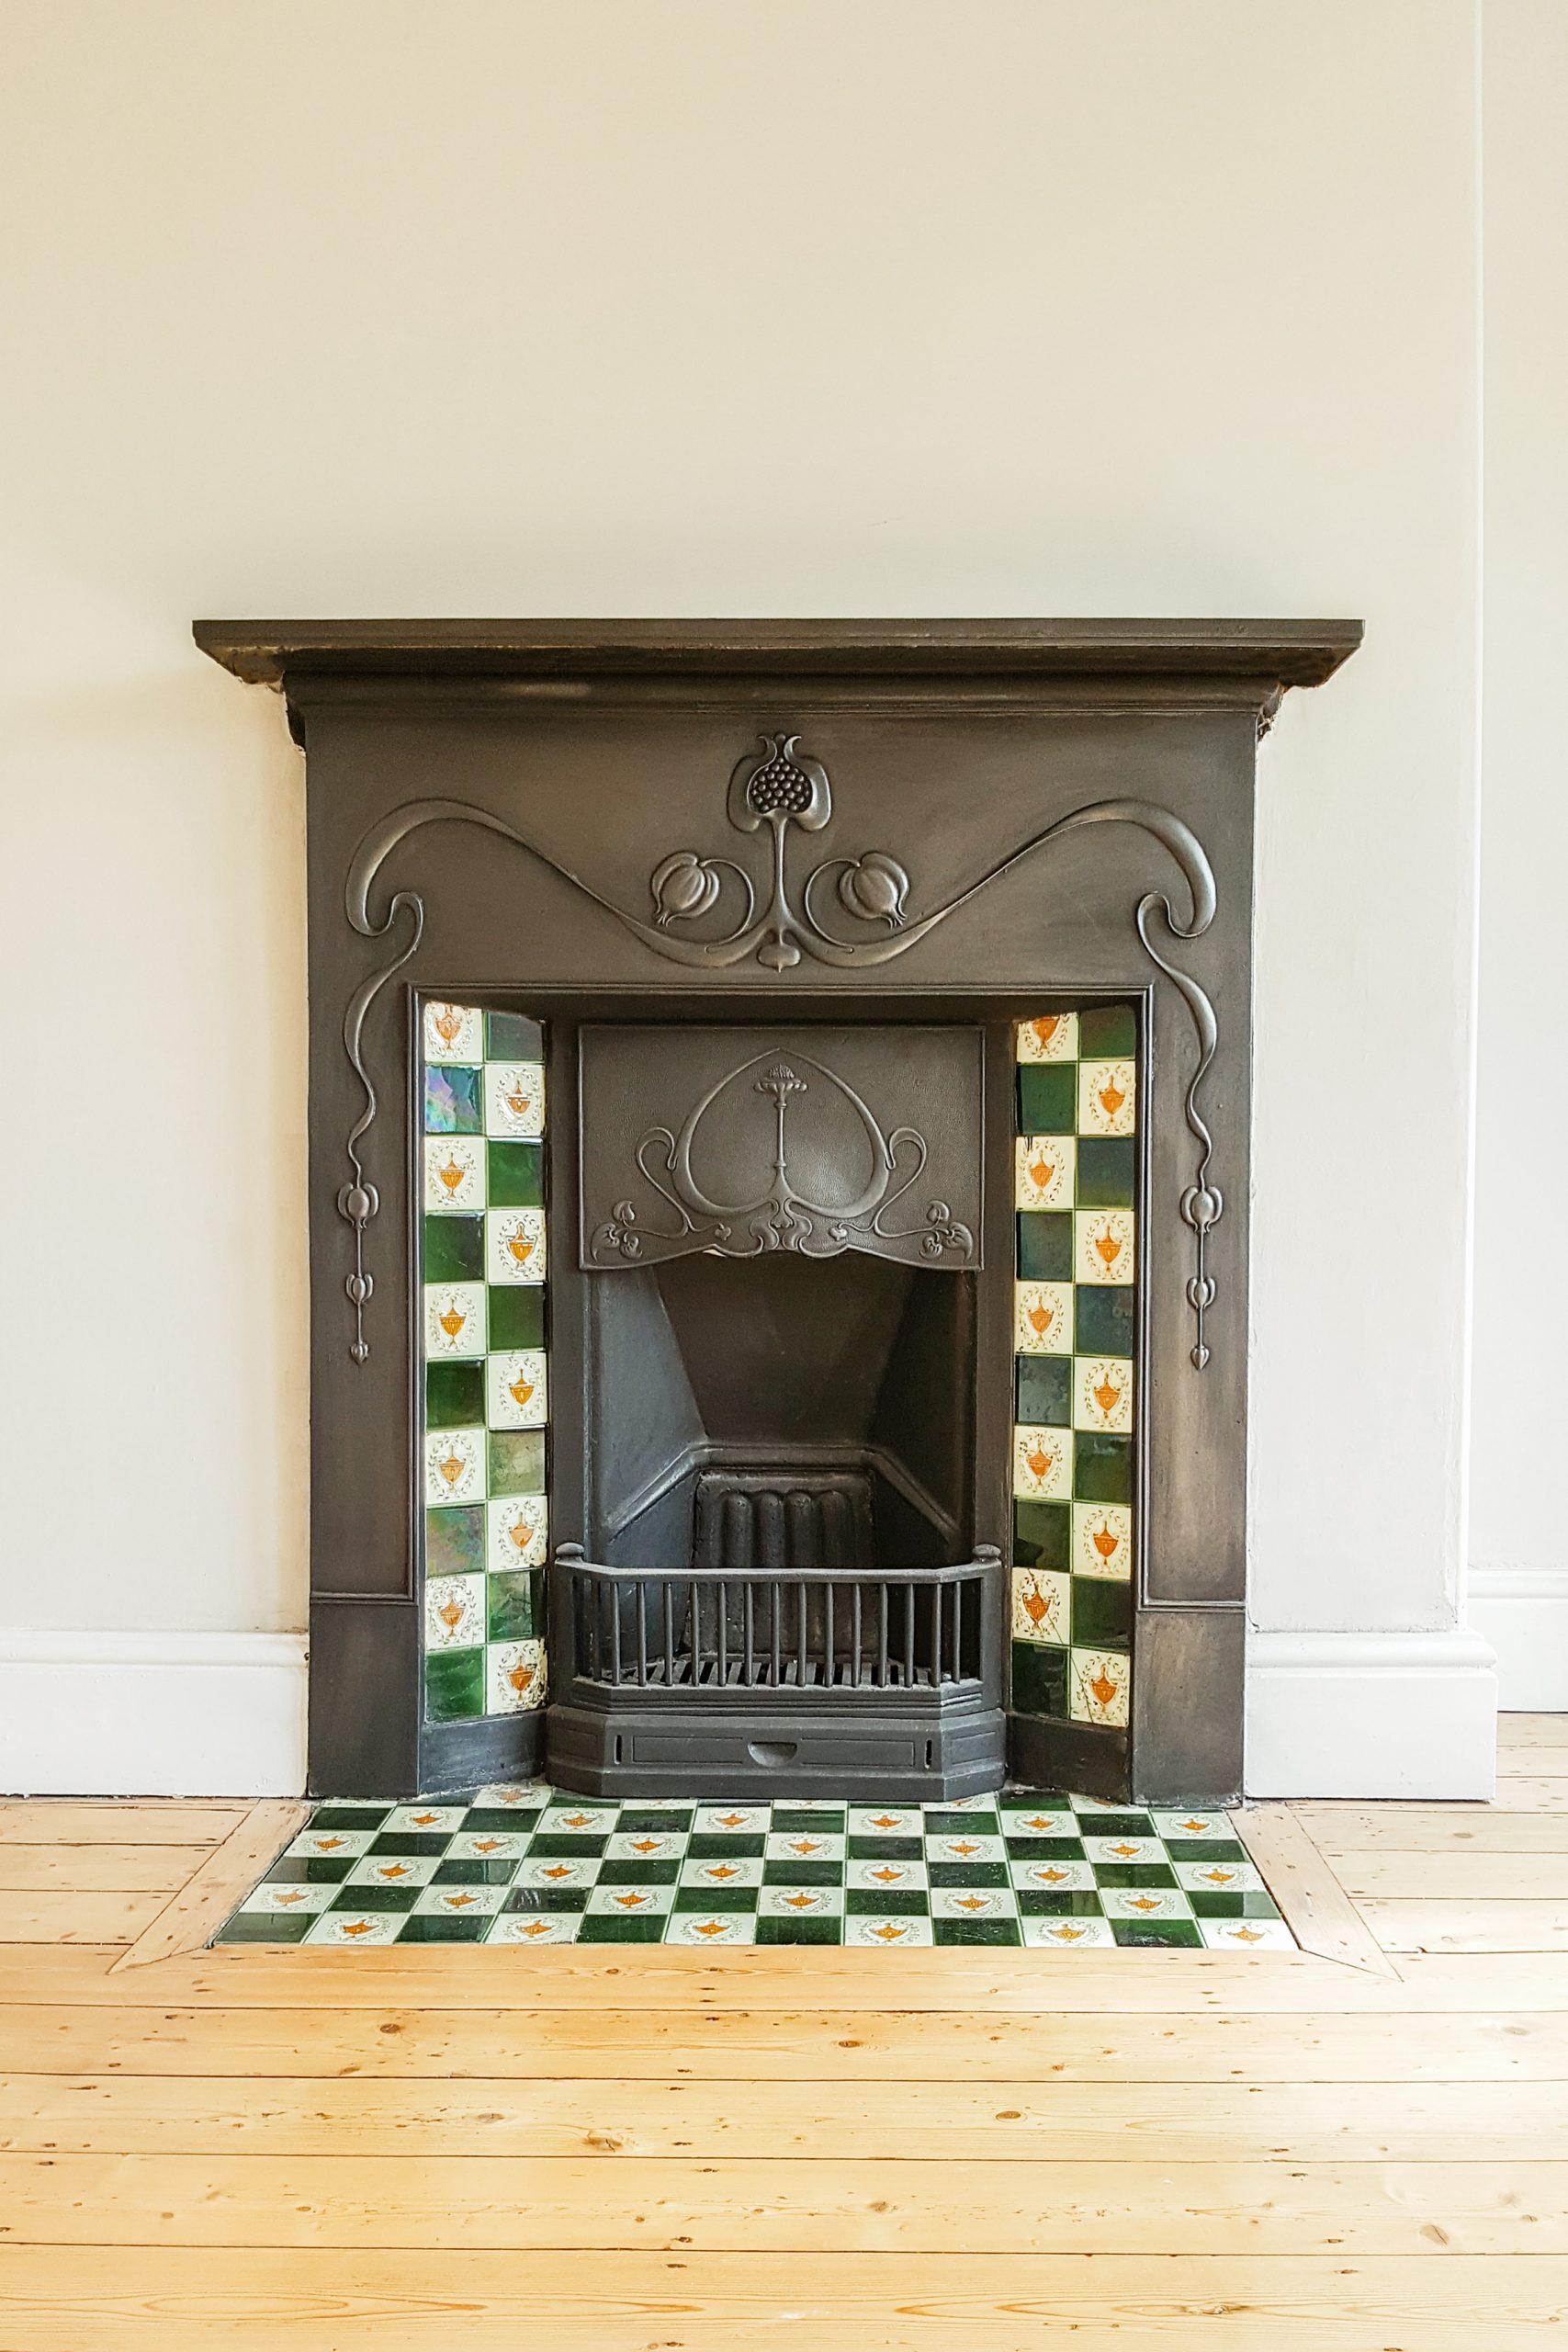 Restored Cast Iron Fireplace Farrow Ball Skimming Stone Walls scaled